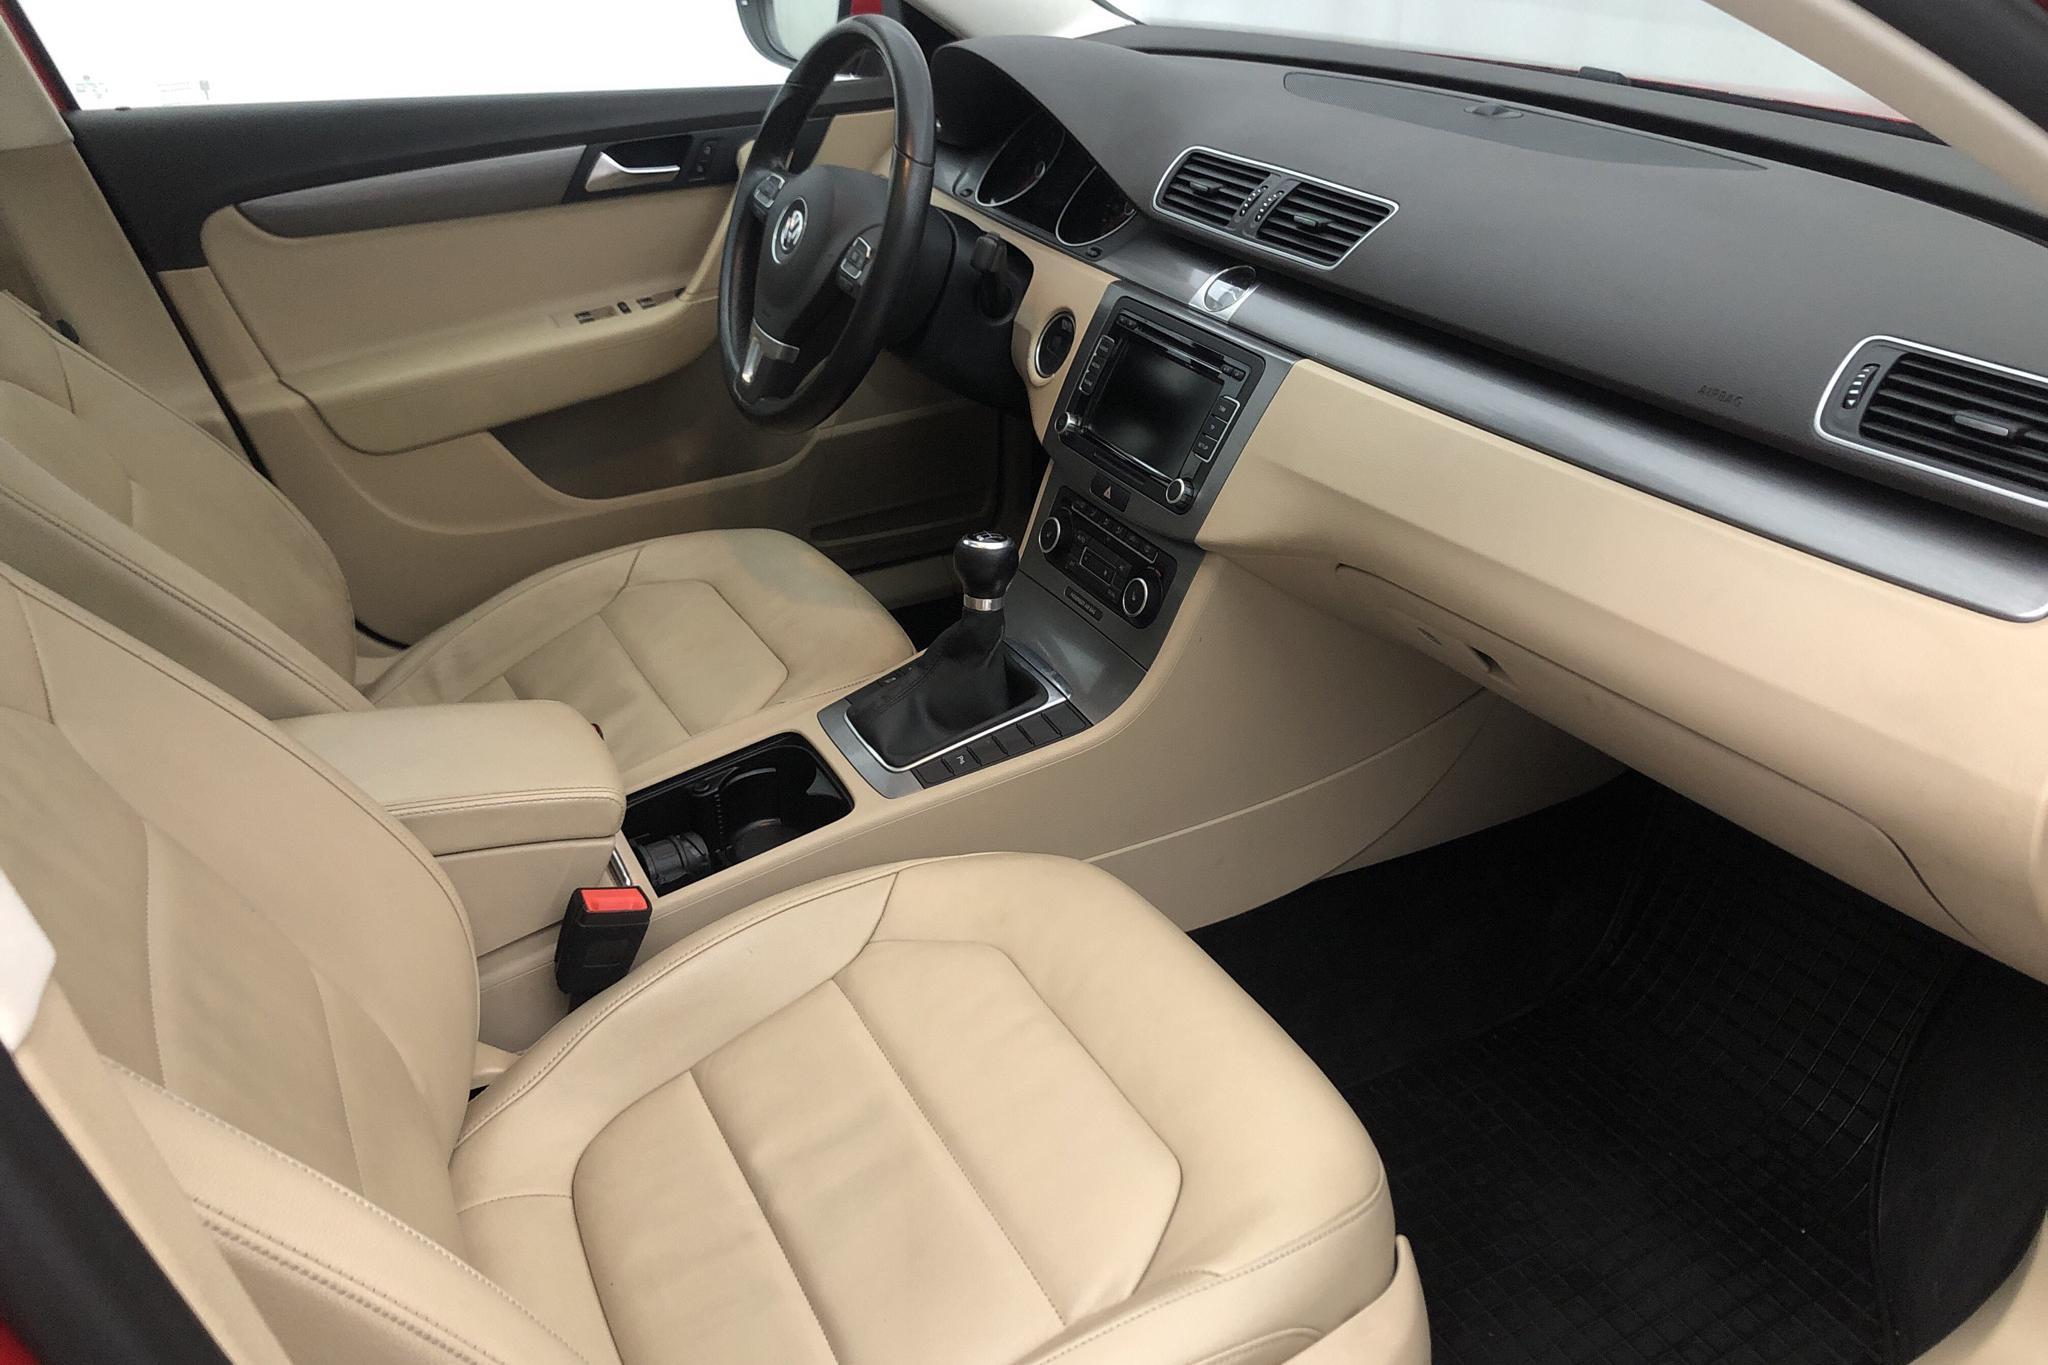 VW Passat 1.4 TSI EcoFuel Variant (150hk) - 174 680 km - Manual - red - 2012